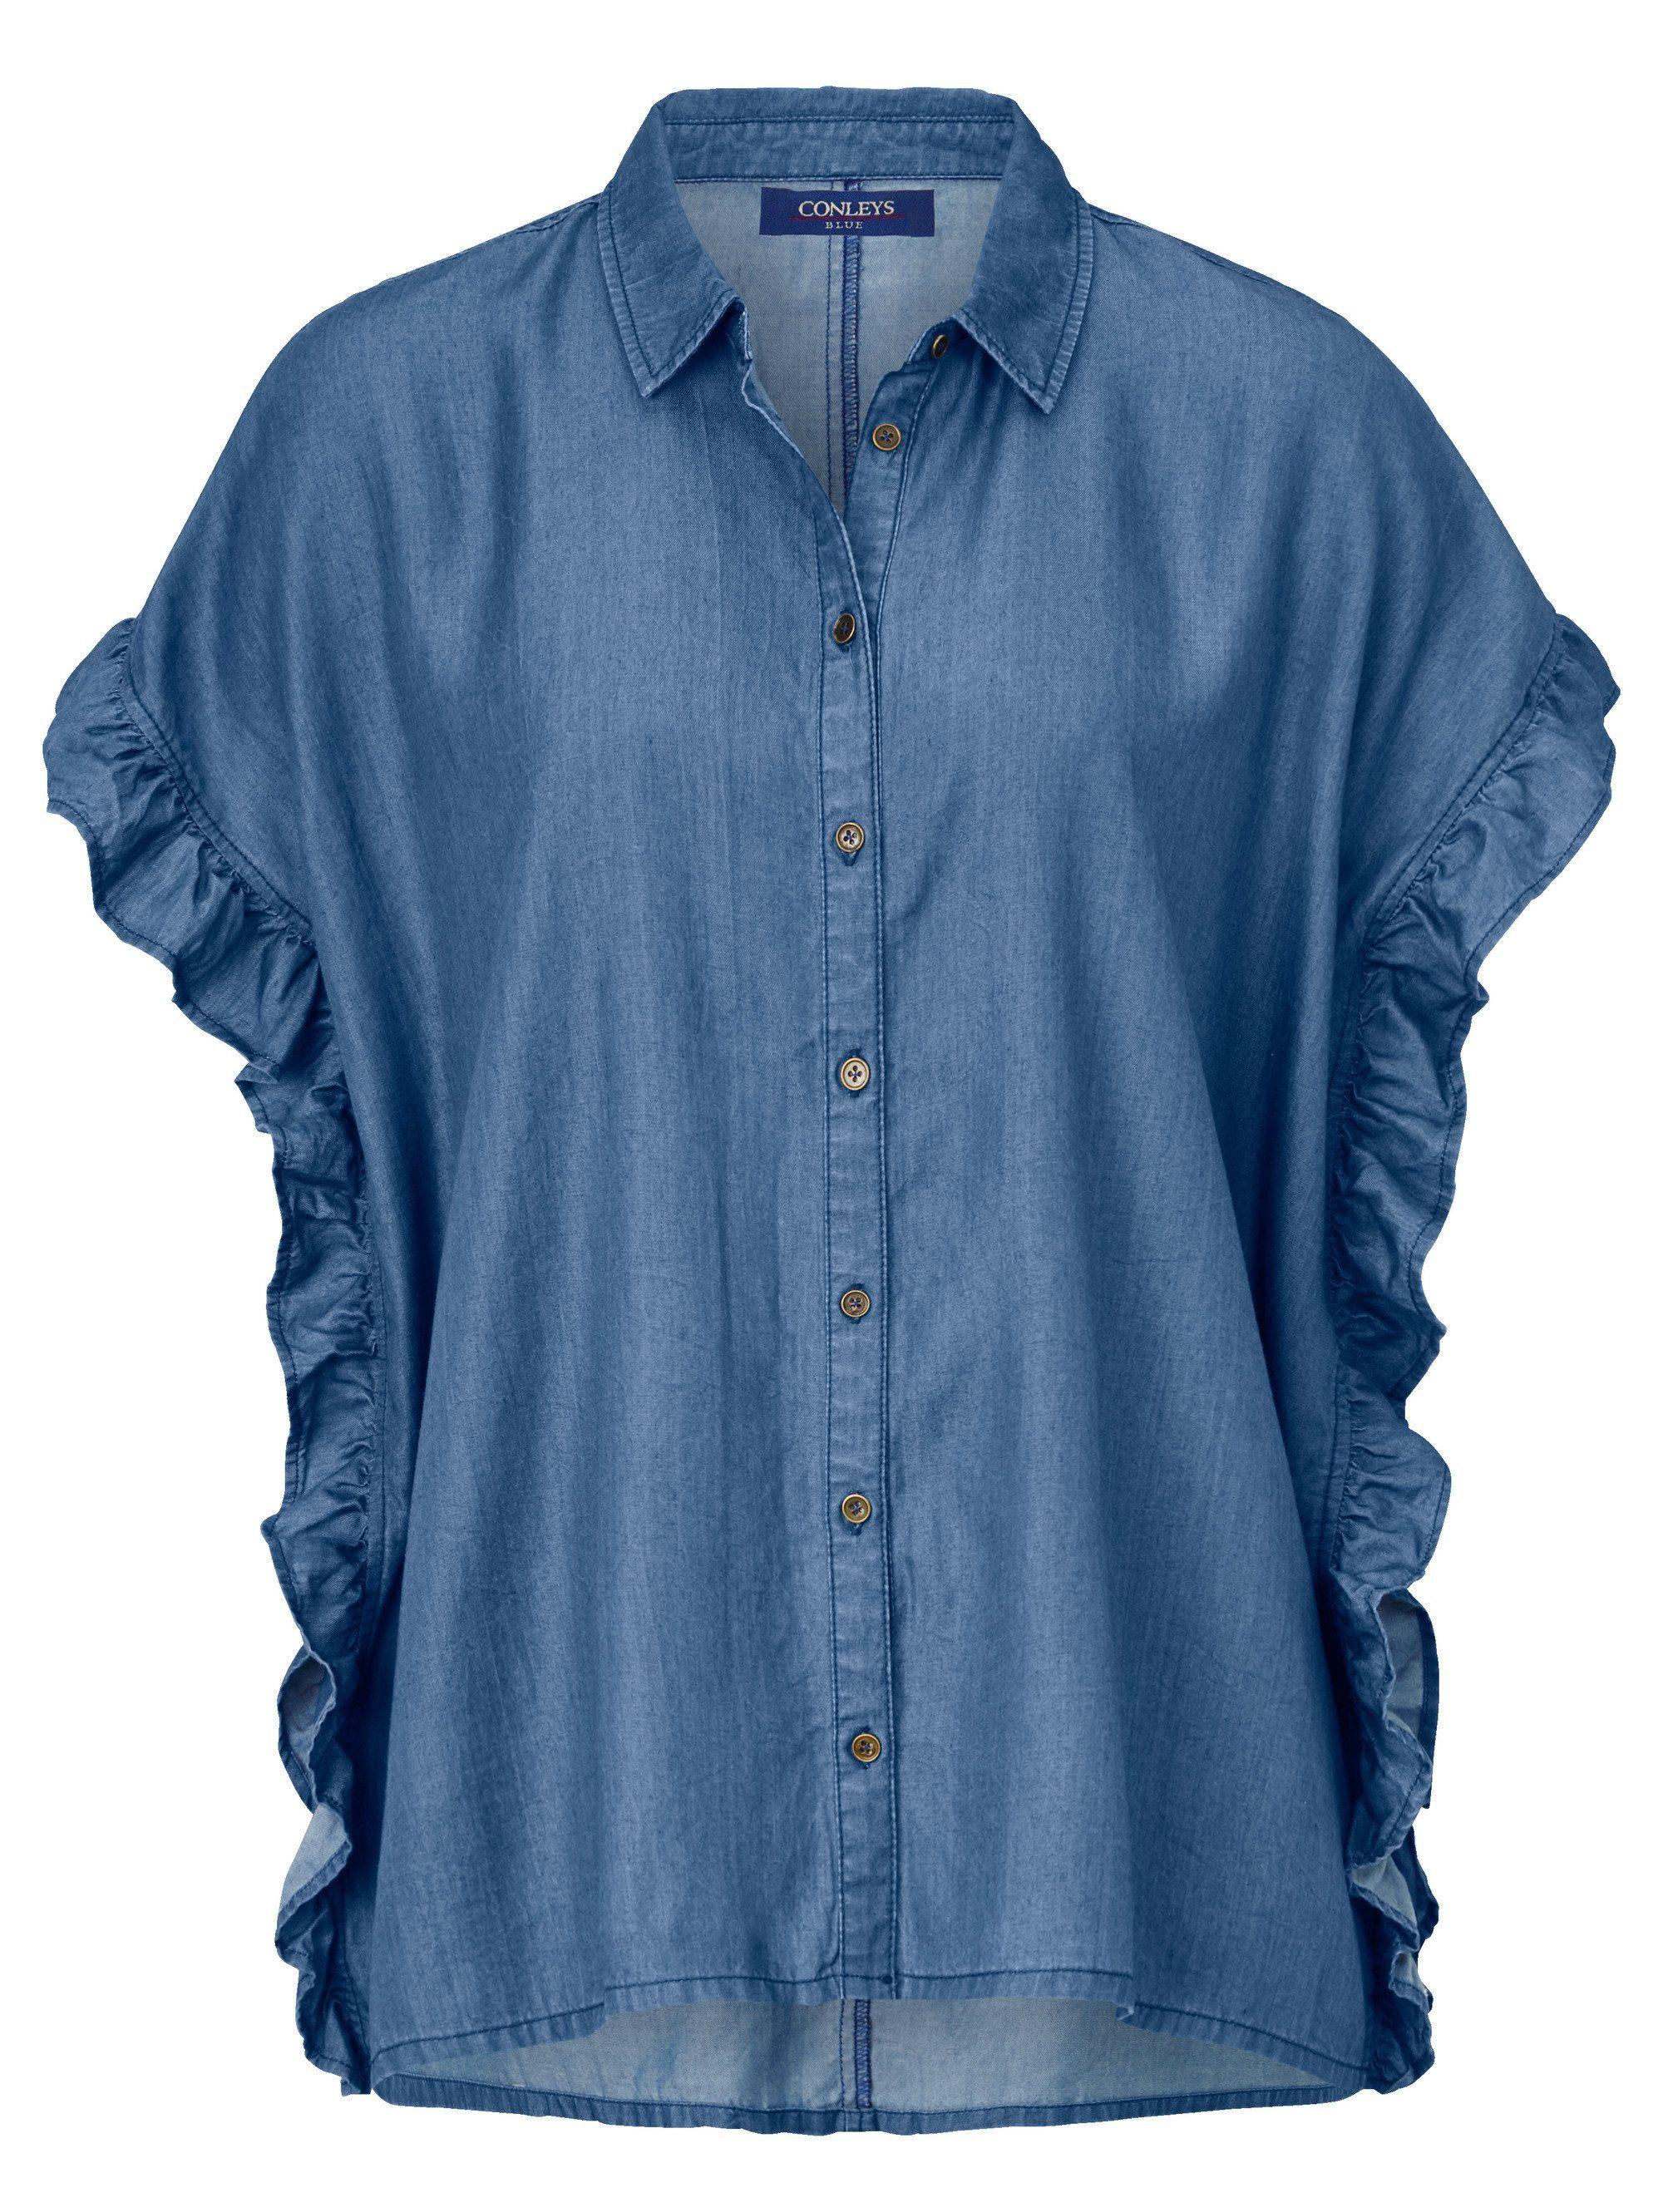 Conleys Blue Bluse im Denimlook